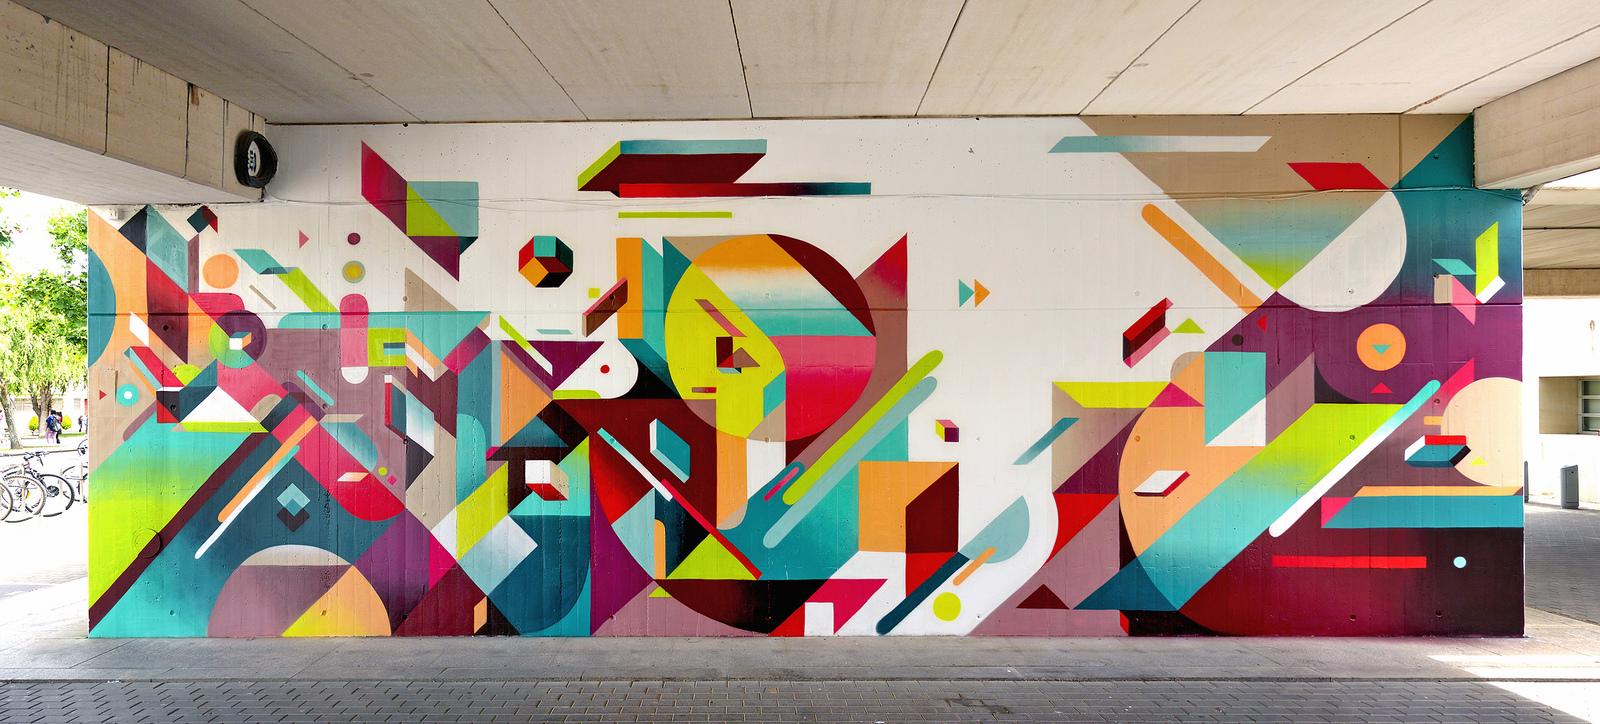 nelio new mural in valencia spain streetartnews. Black Bedroom Furniture Sets. Home Design Ideas